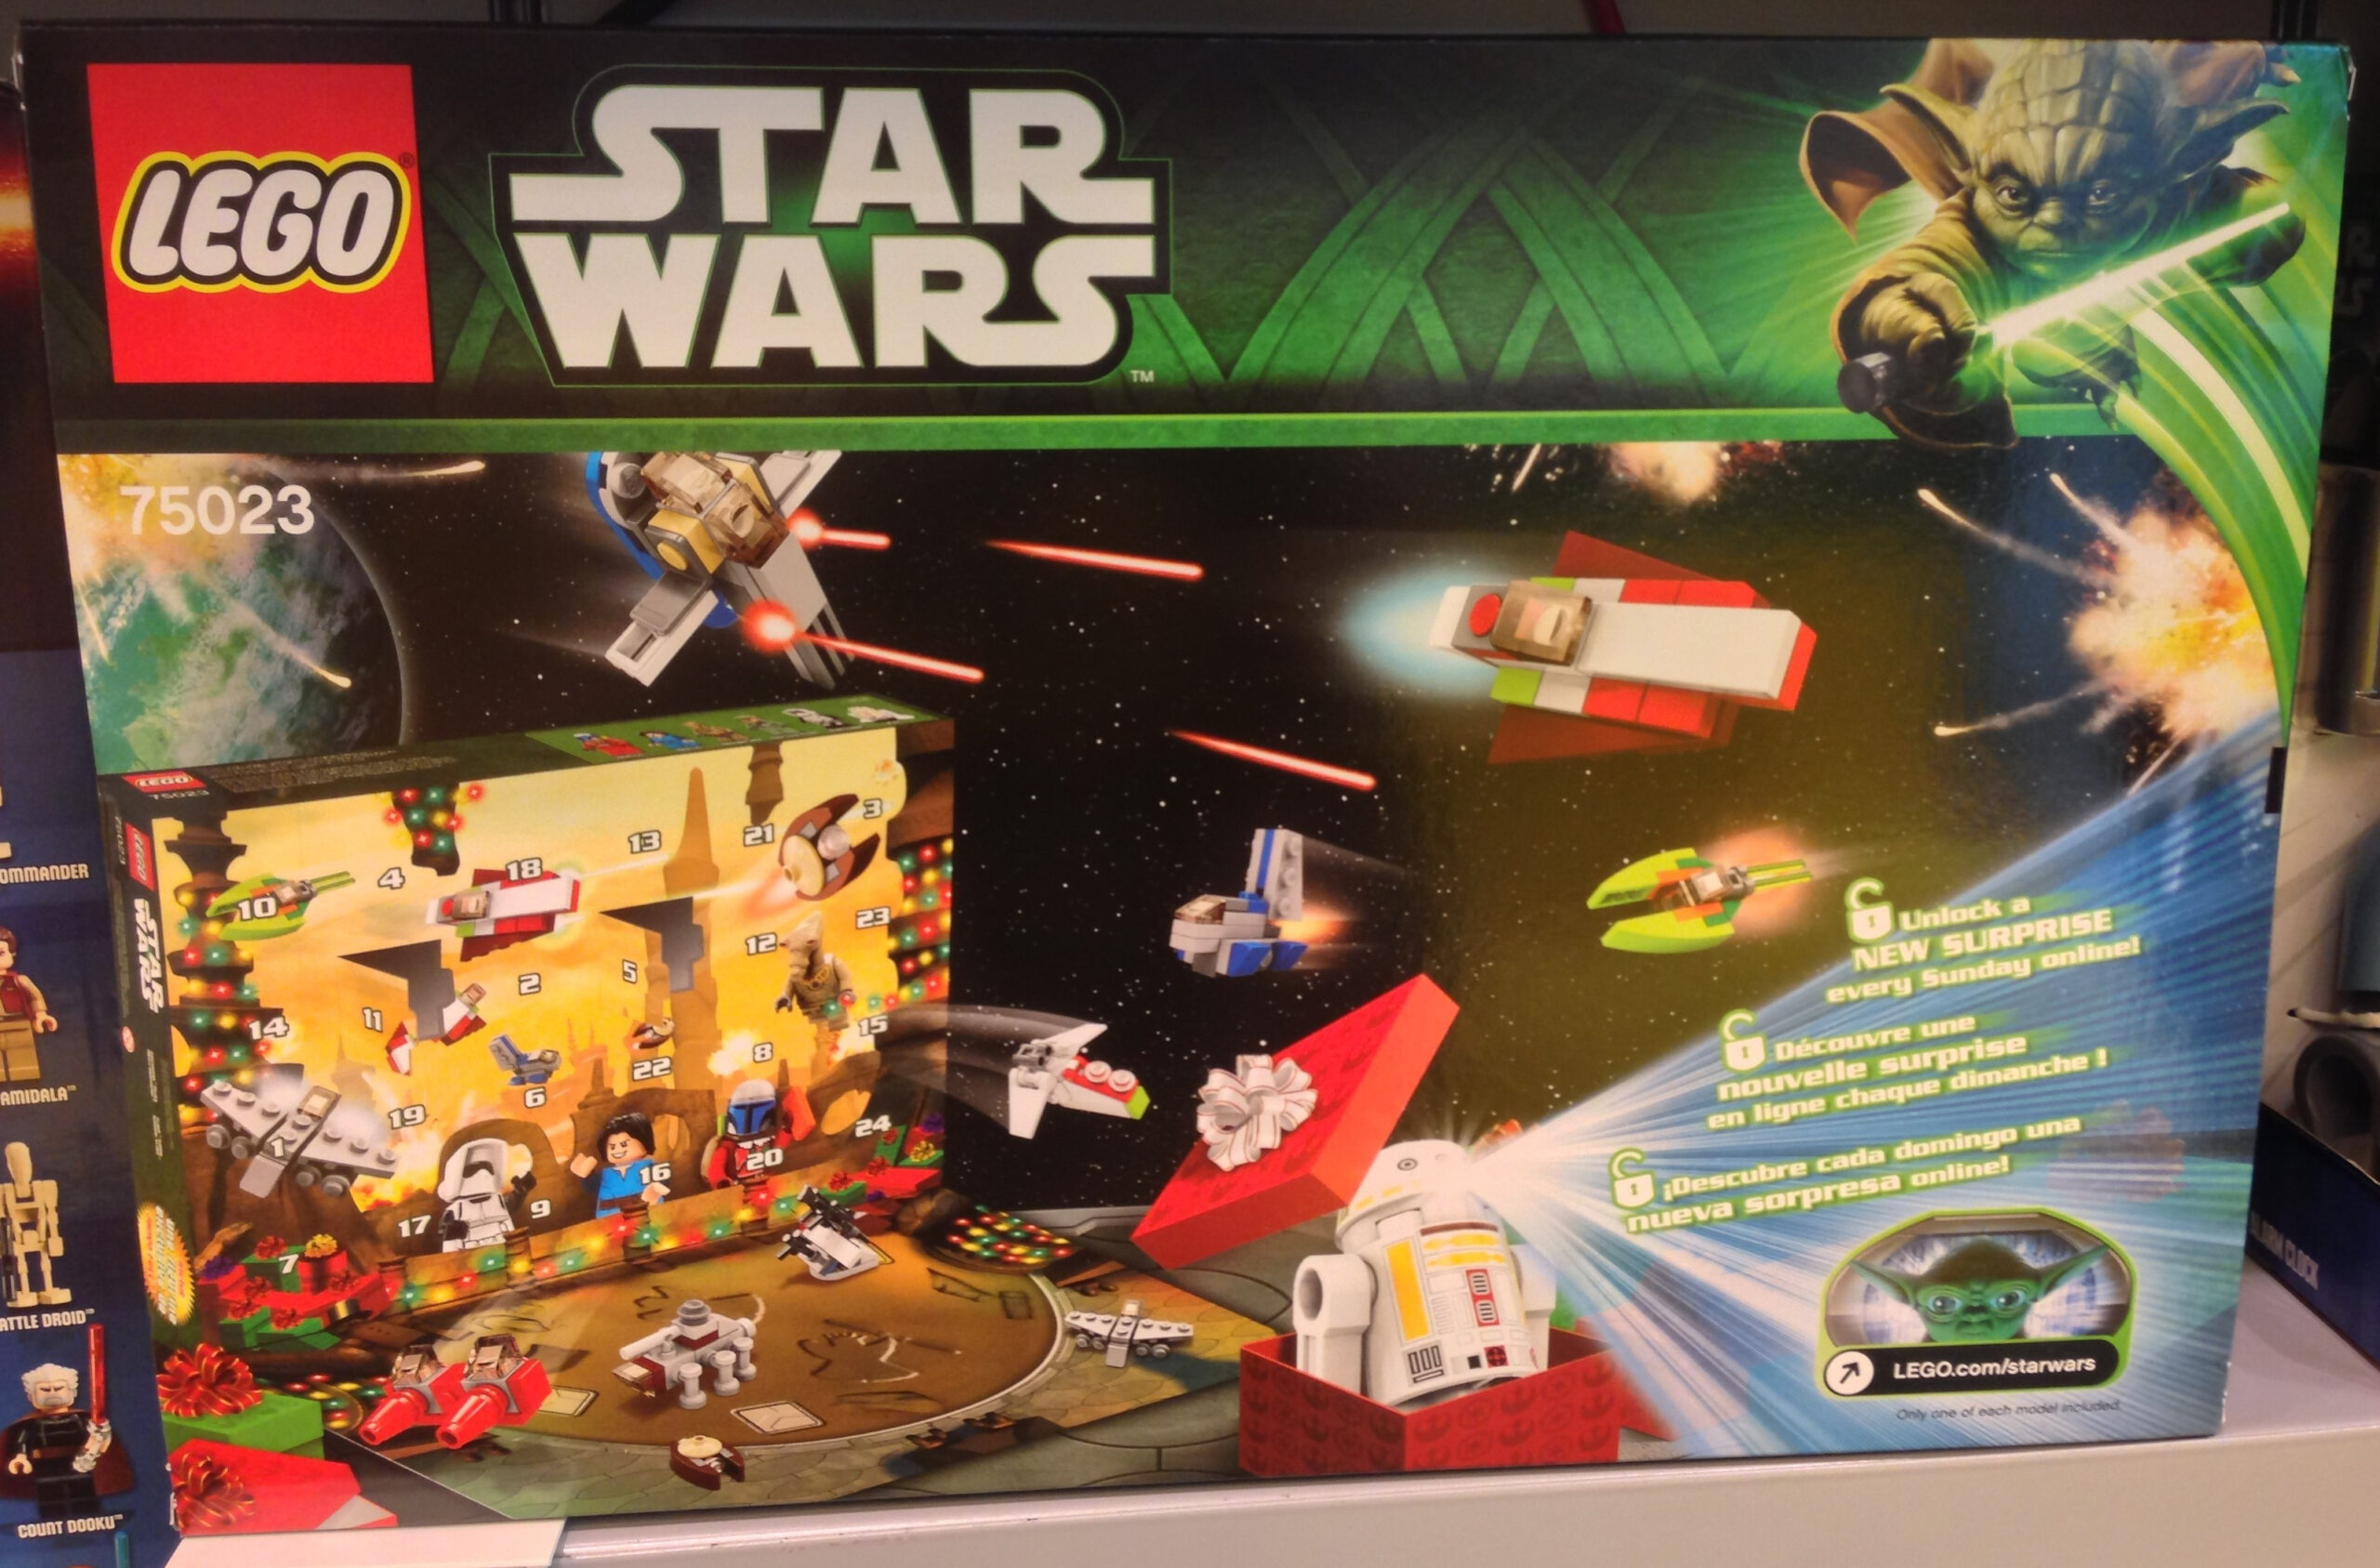 2013 Lego Star Wars Advent Calendar 75023 Released In intended for Lego Star Wars Advent Calendar 2013